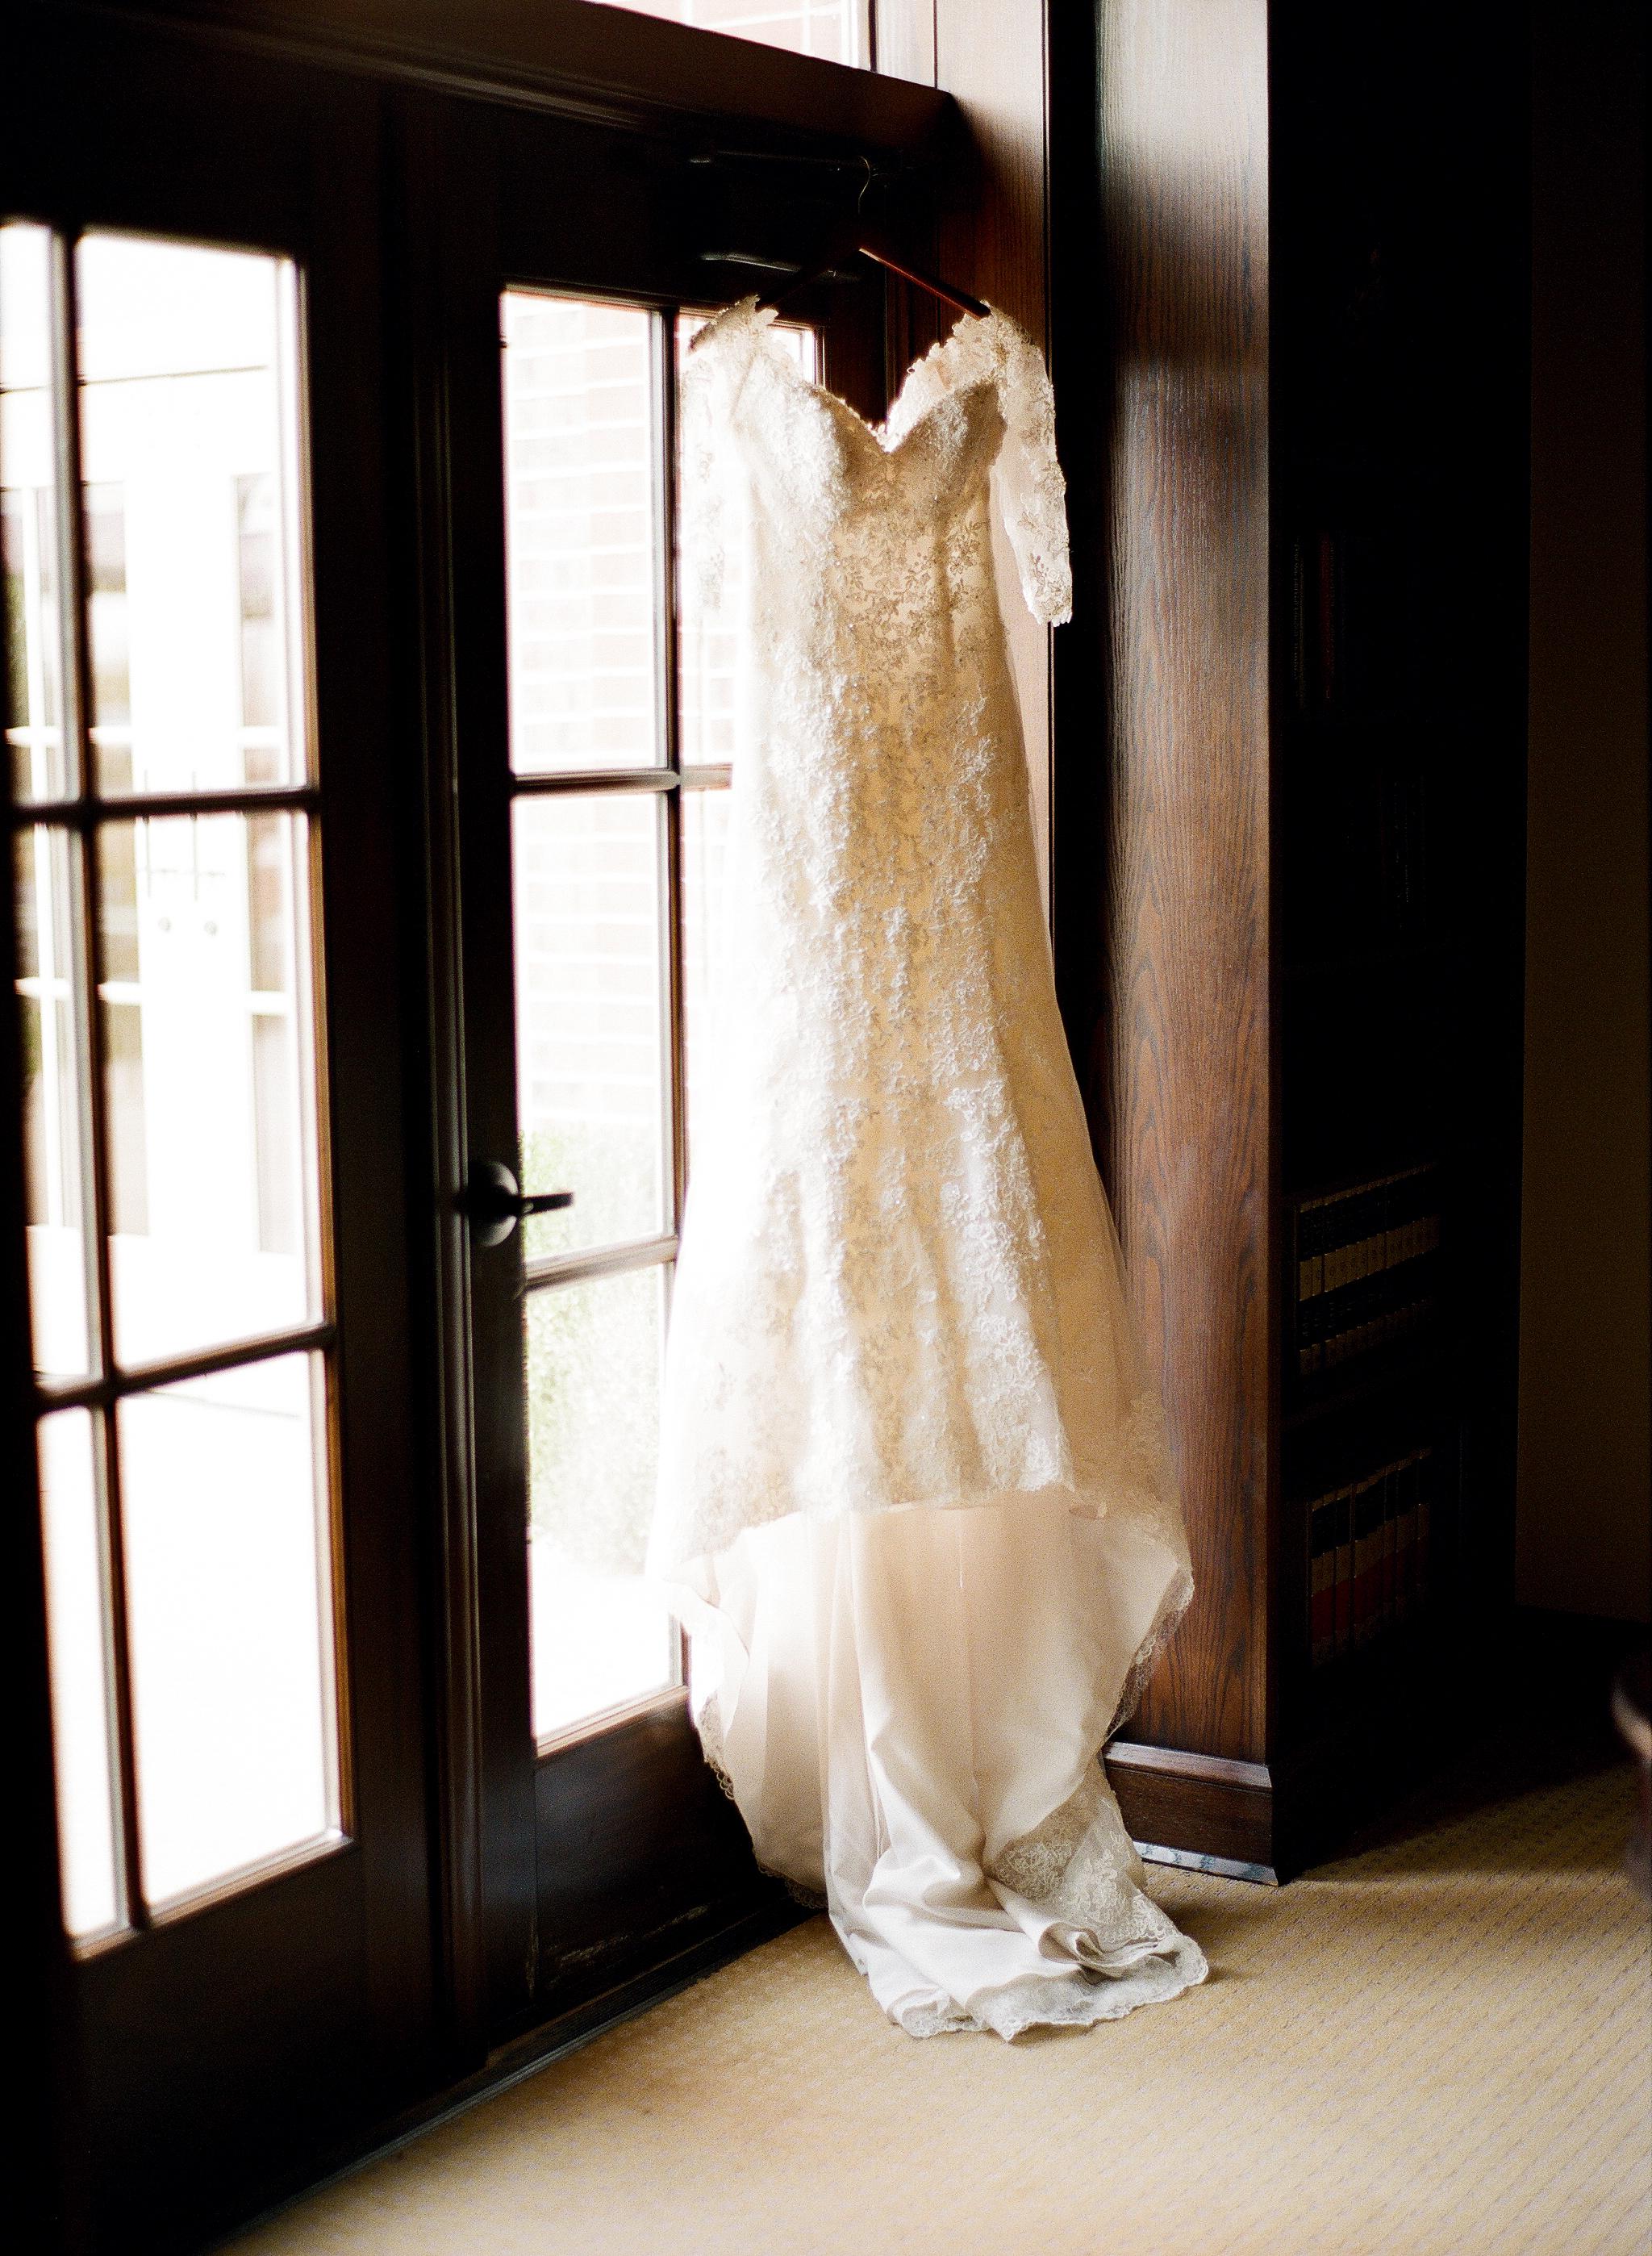 Magnolia Adams Photography | Bridal Gown